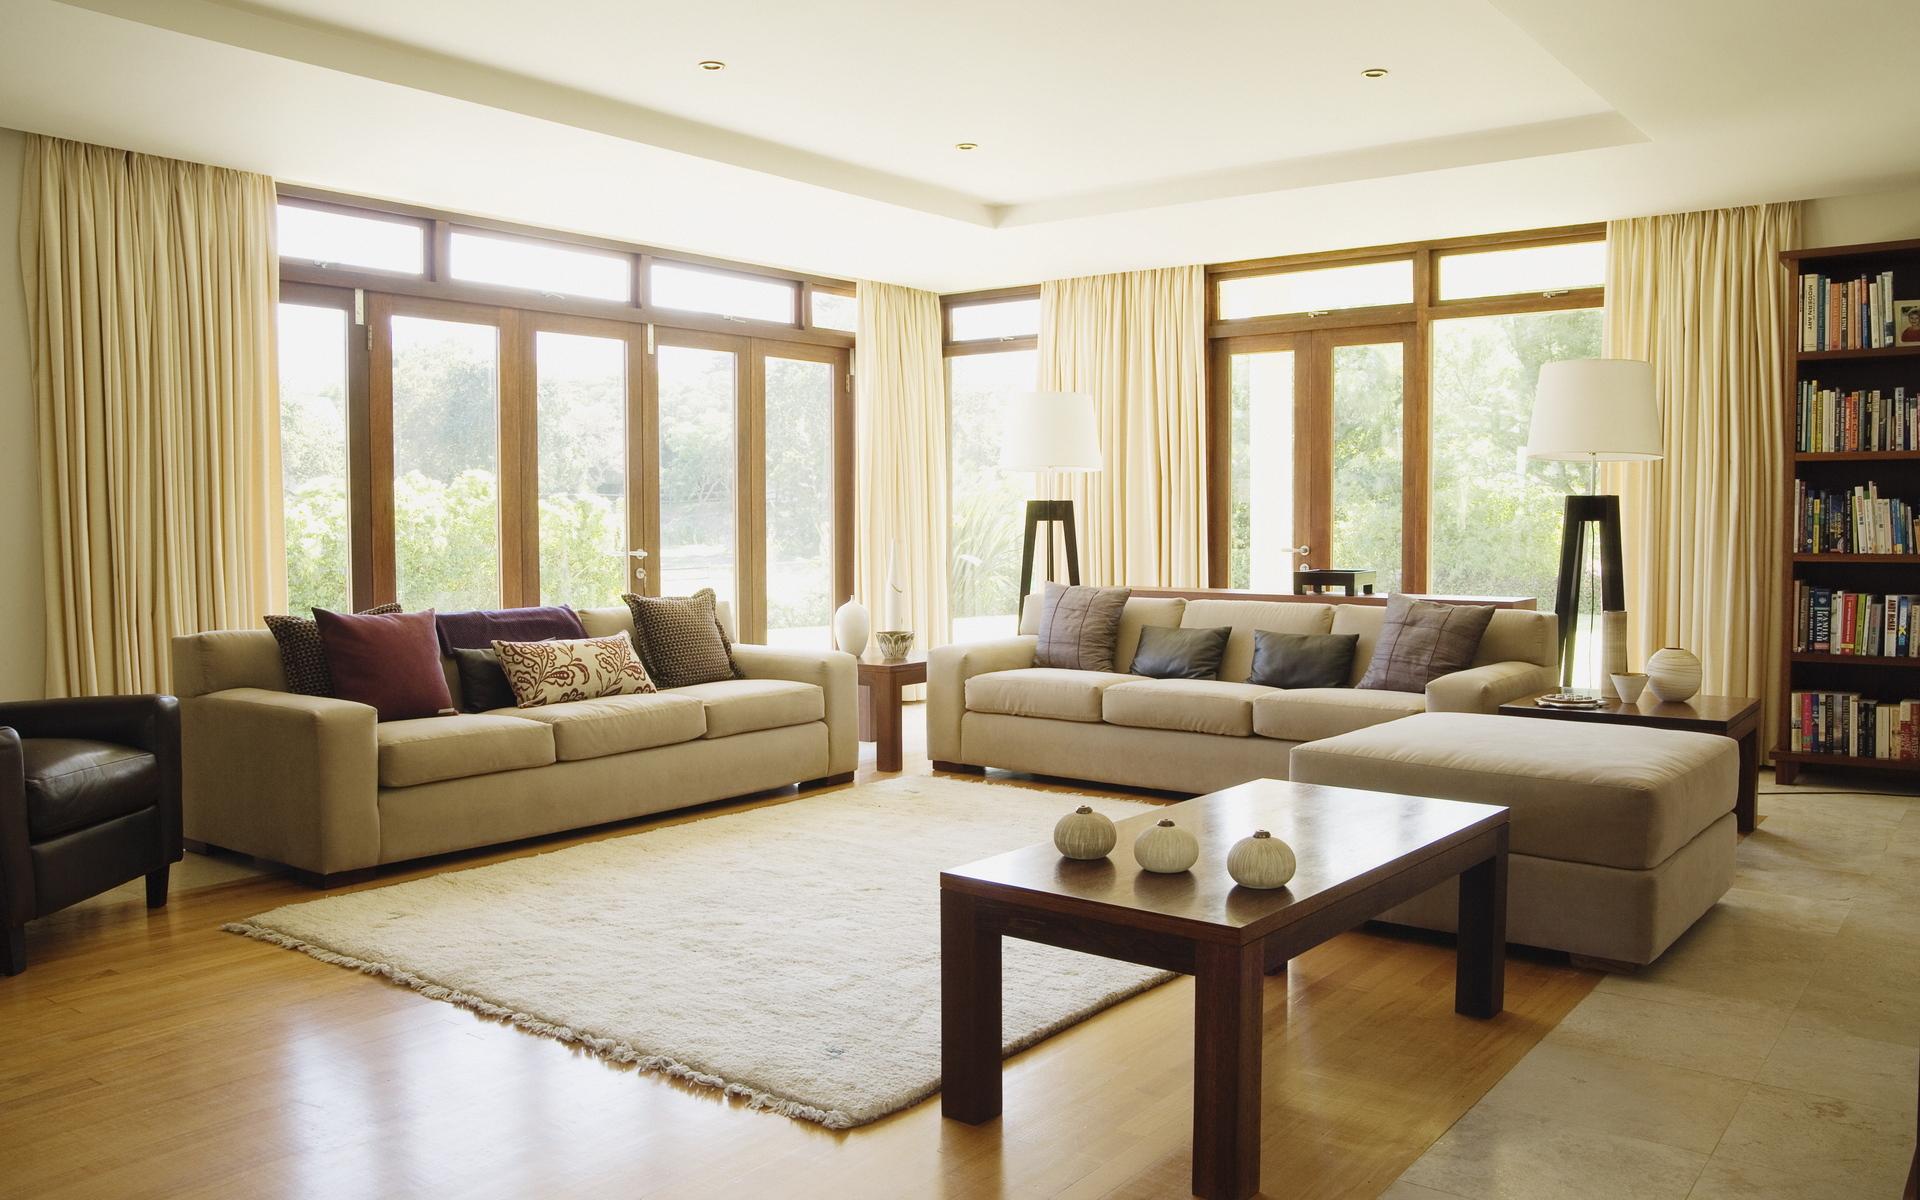 interior-design-interior-design-room-furniture-sofas-chairs-desks-carpet-windows-blinds-curtains